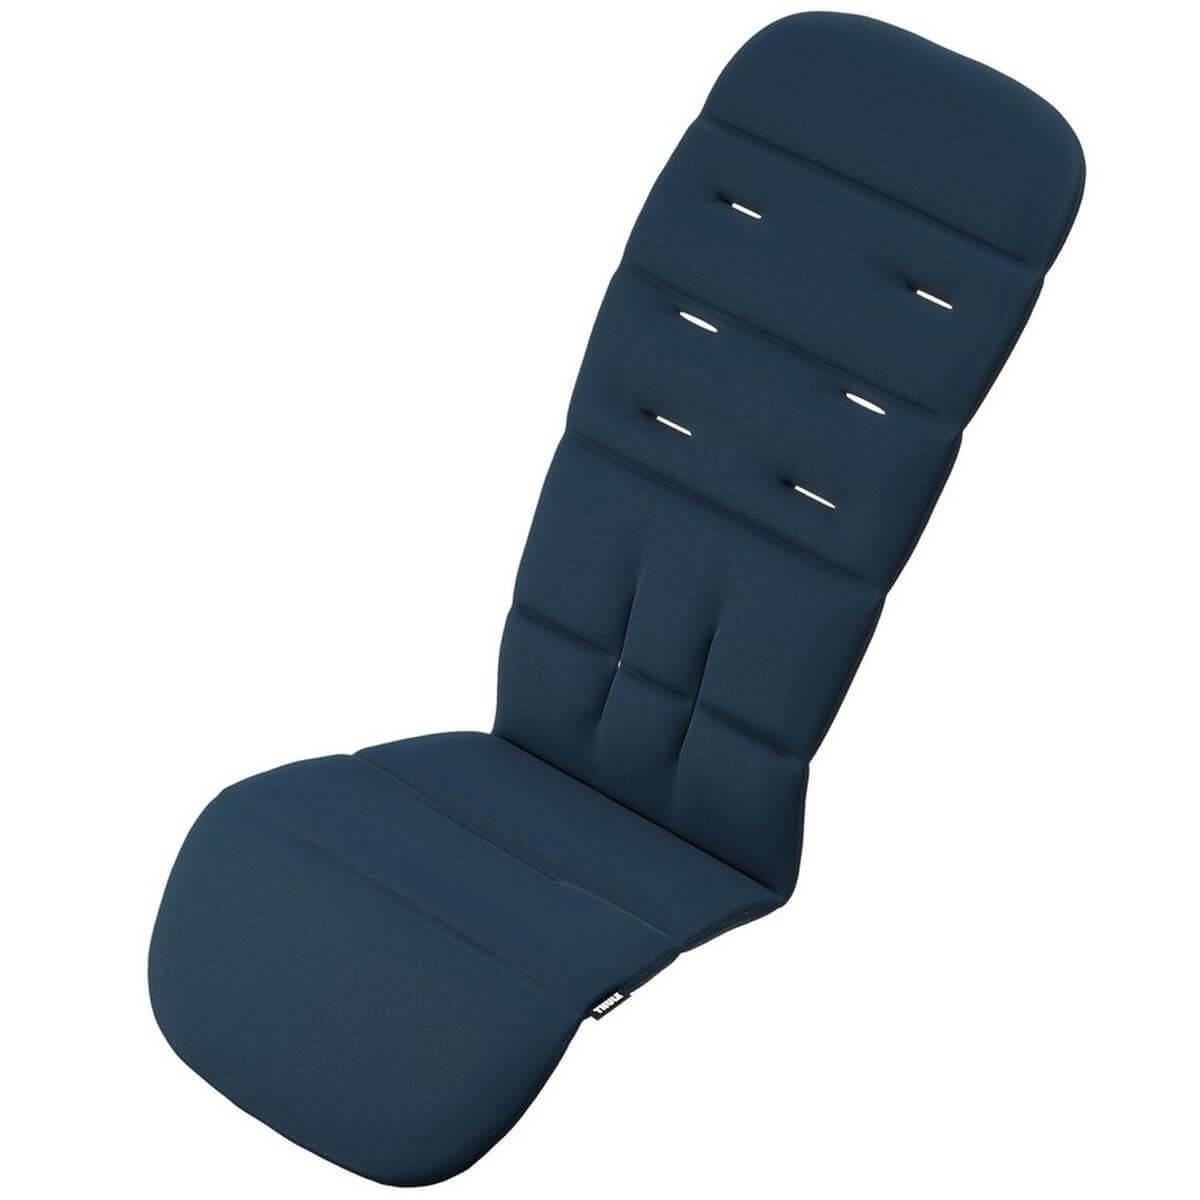 Coussin confort Thule navy blue